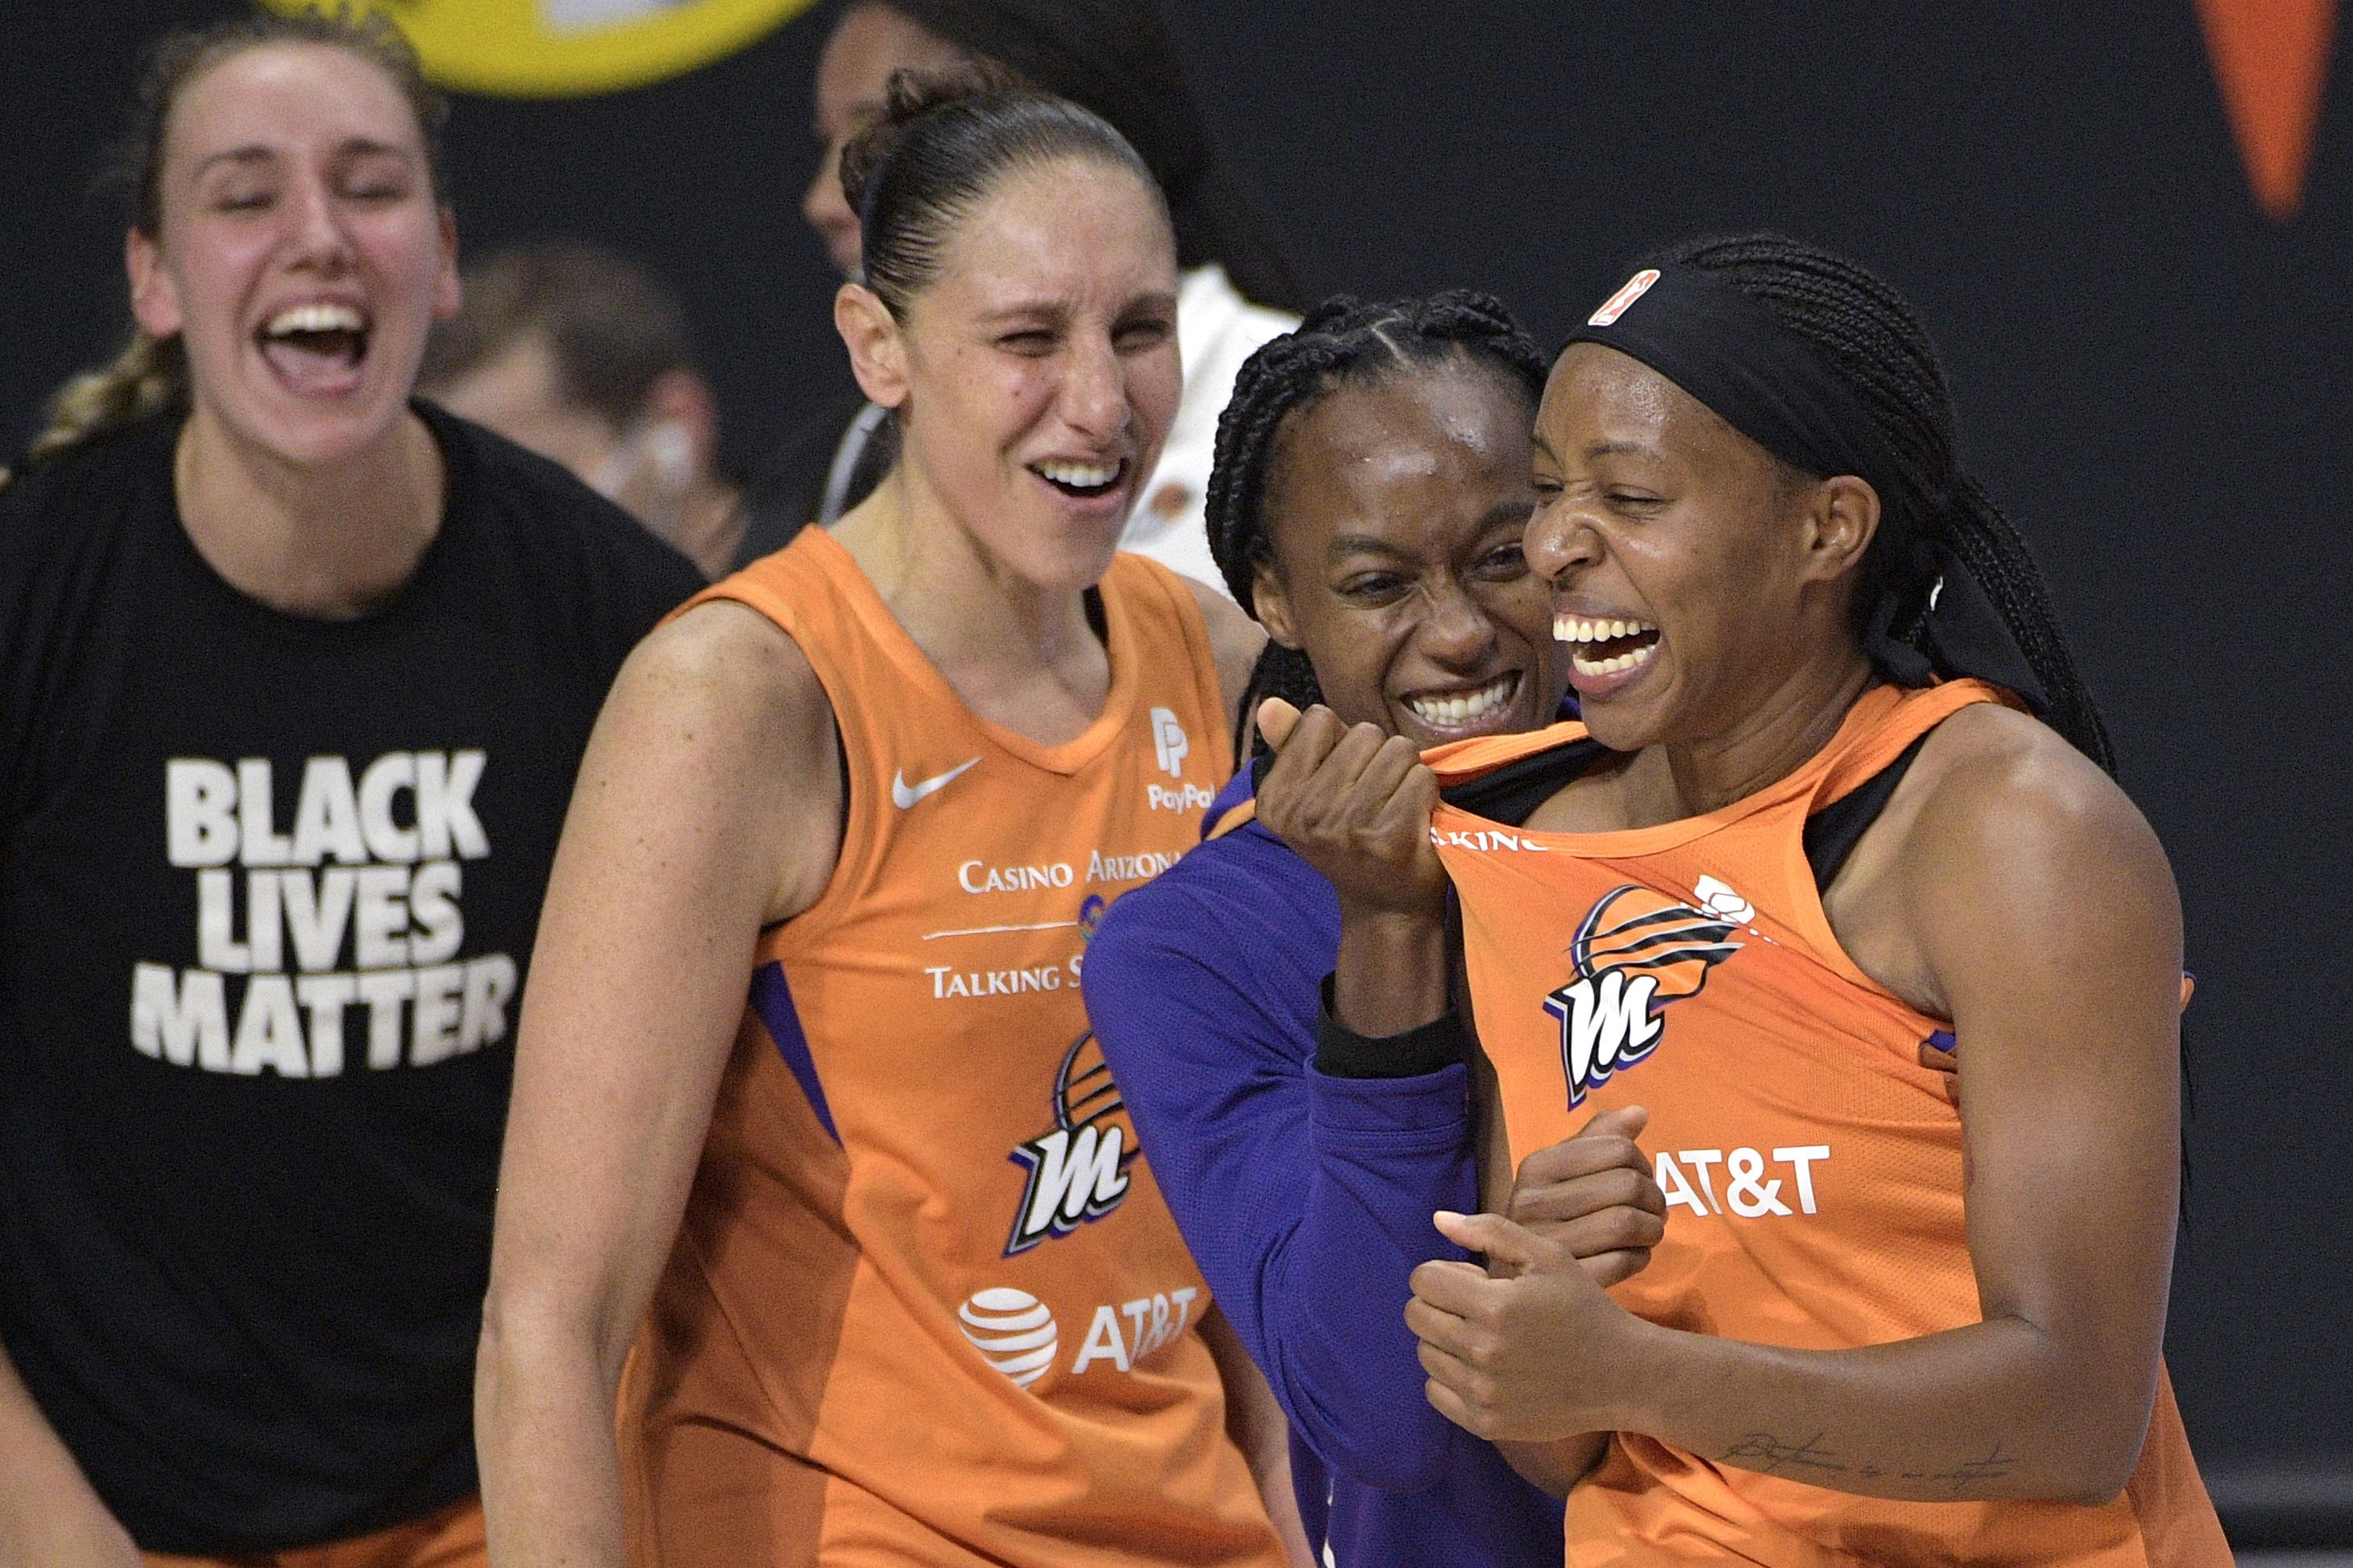 WNBA Playoffs second round odds